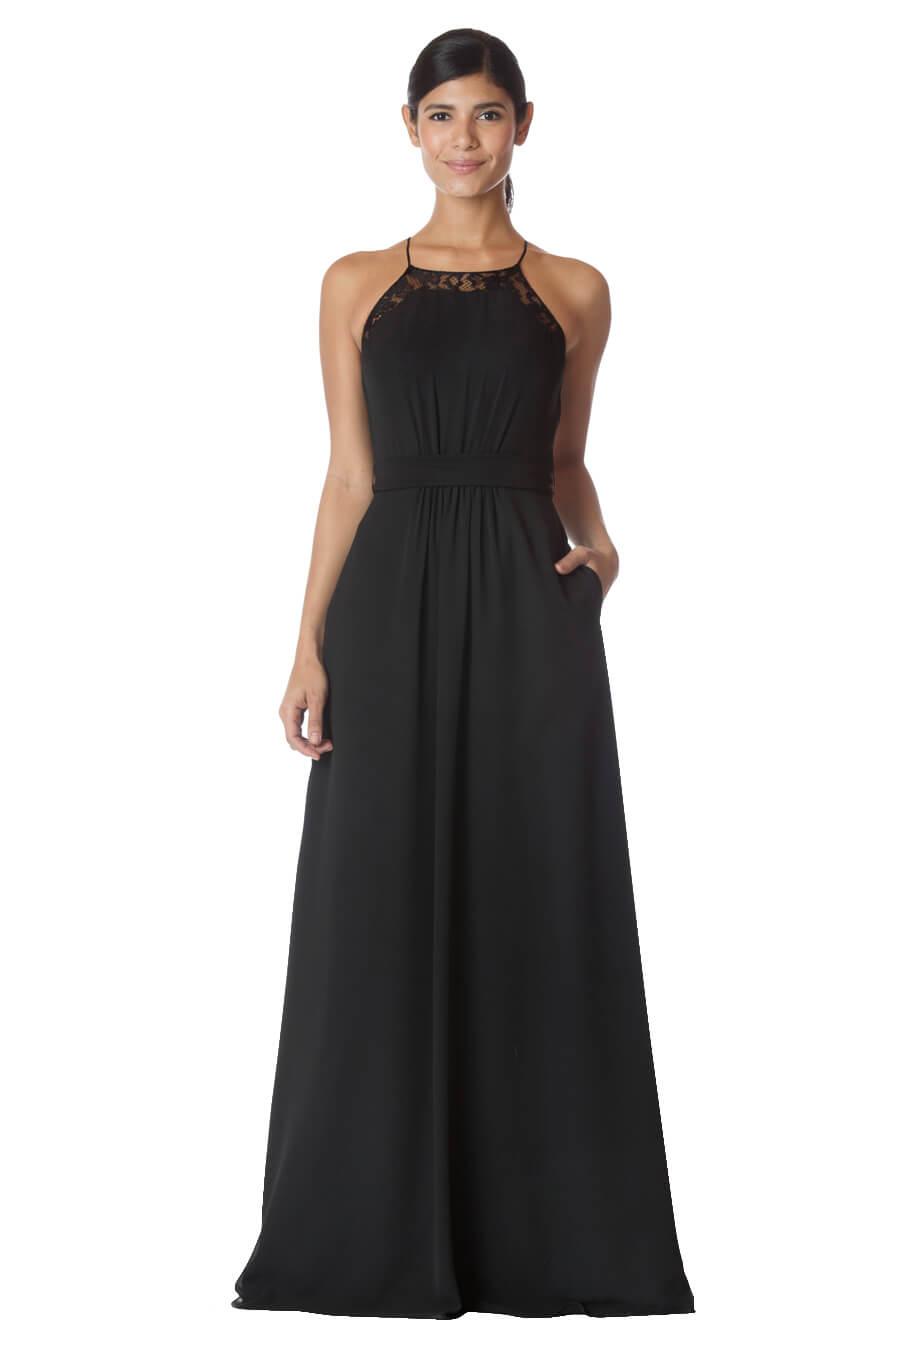 Bari jay bridesmaids bridesmaid dresses prom dresses formal bari jay 810 ombrellifo Gallery